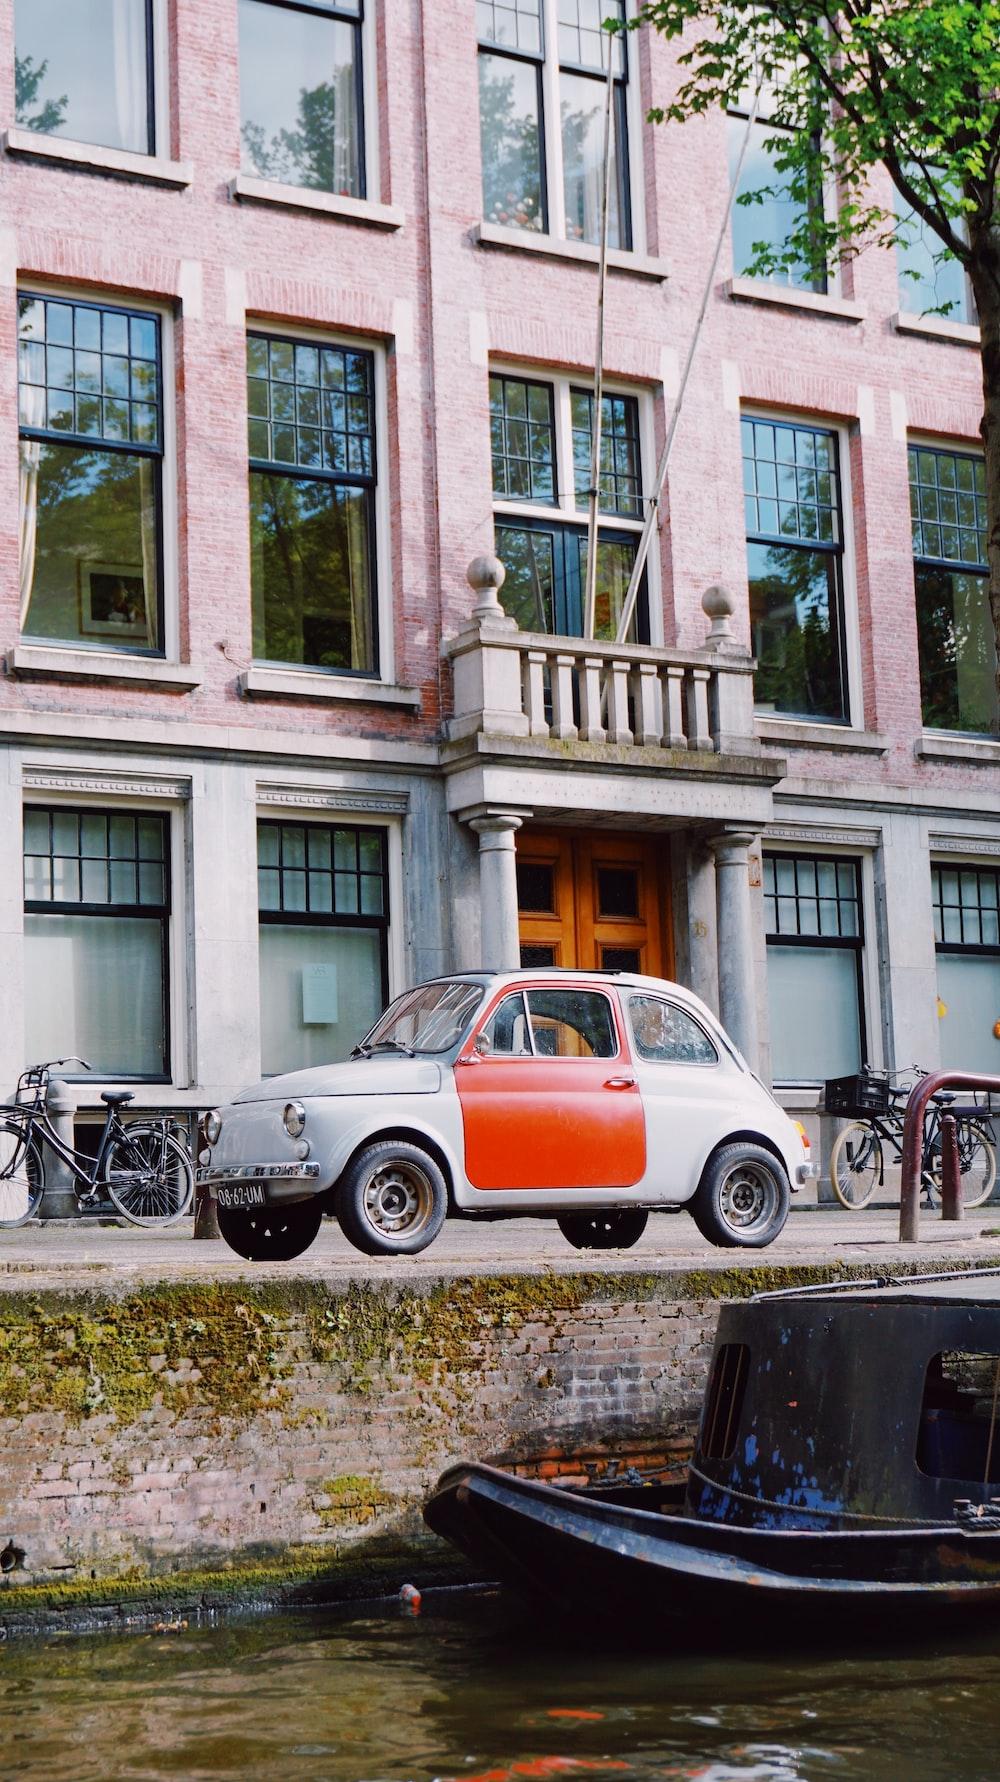 orange and white car parked beside black motorcycle during daytime